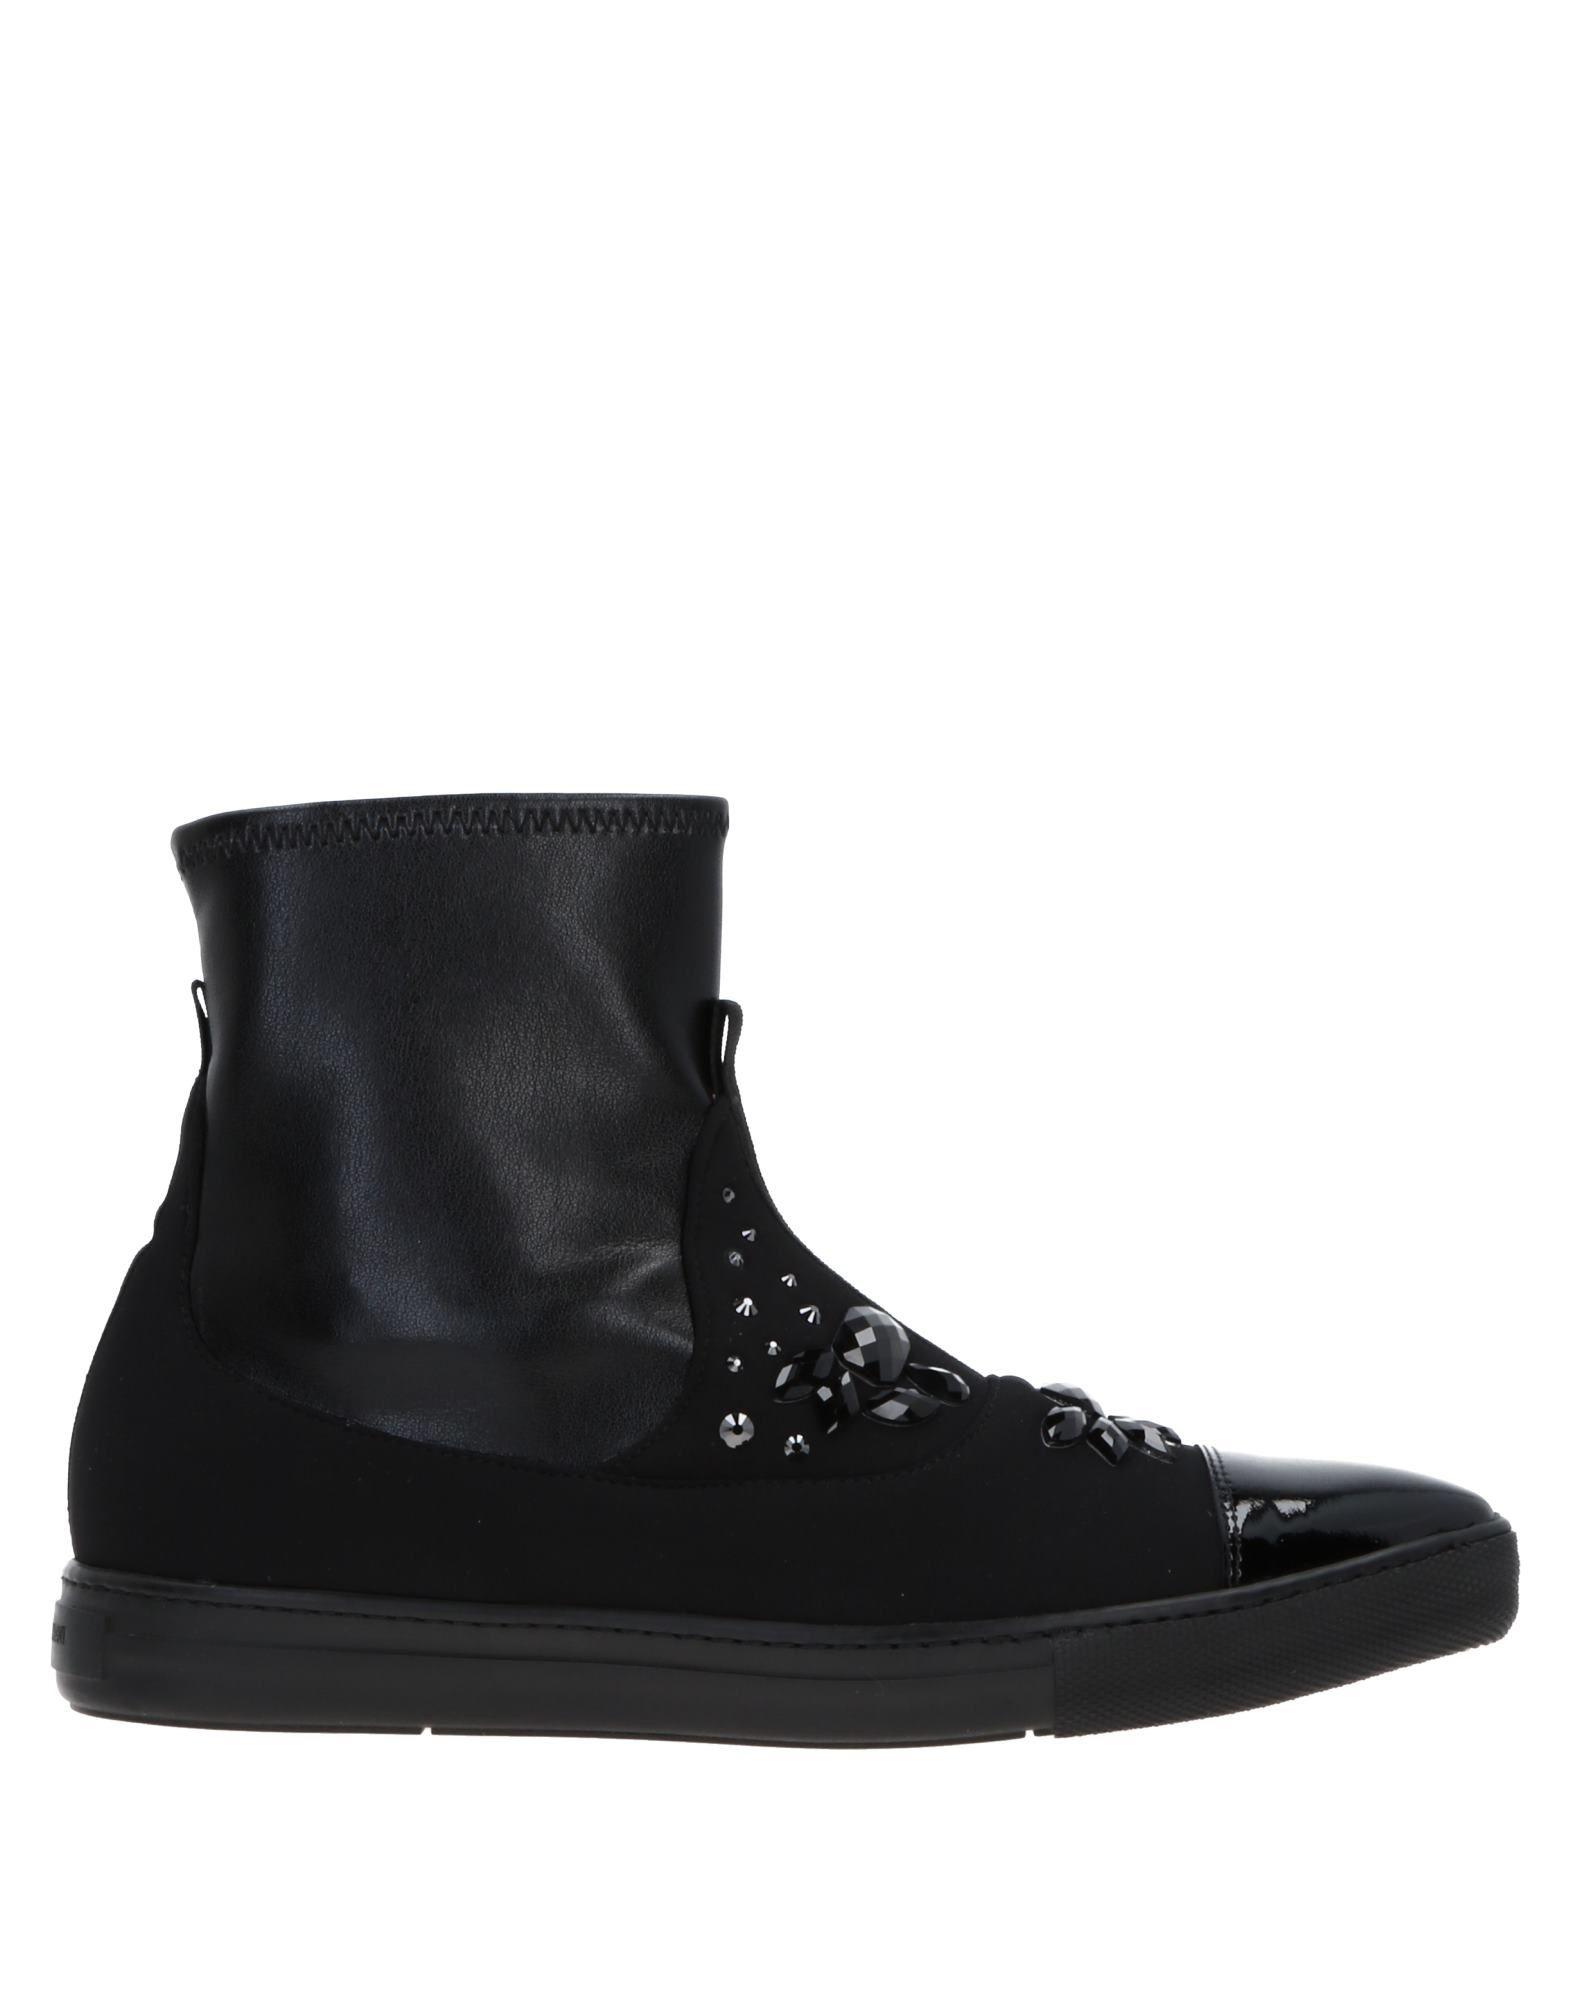 Stilvolle billige Schuhe Damen Alberto Guardiani Stiefelette Damen Schuhe  11520846XM 97d294